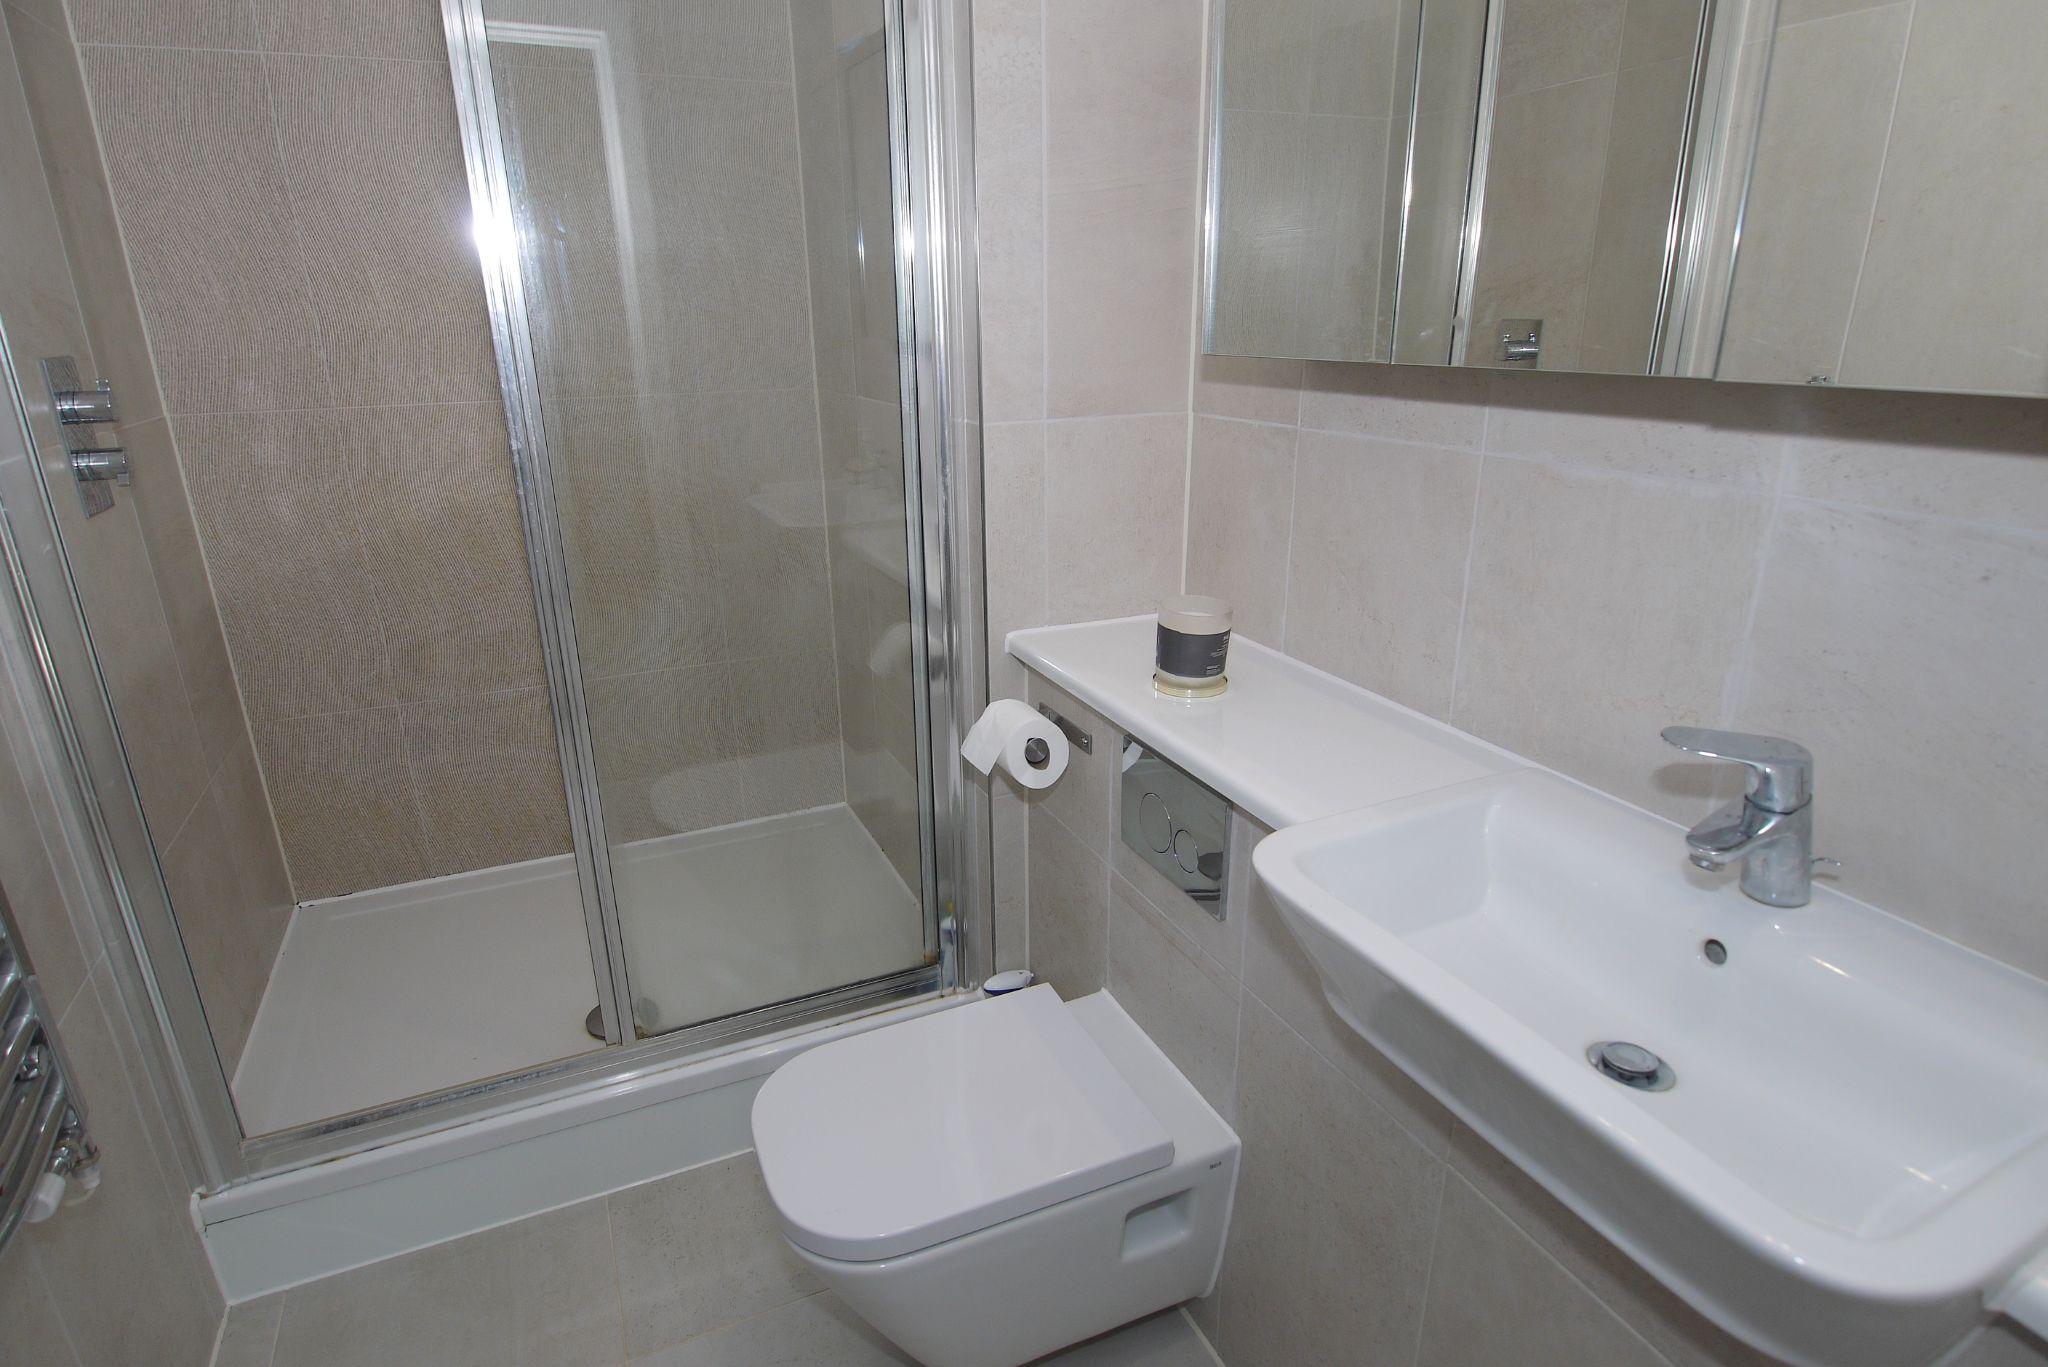 2 bedroom apartment For Sale in Sevenoaks - Photograph 8